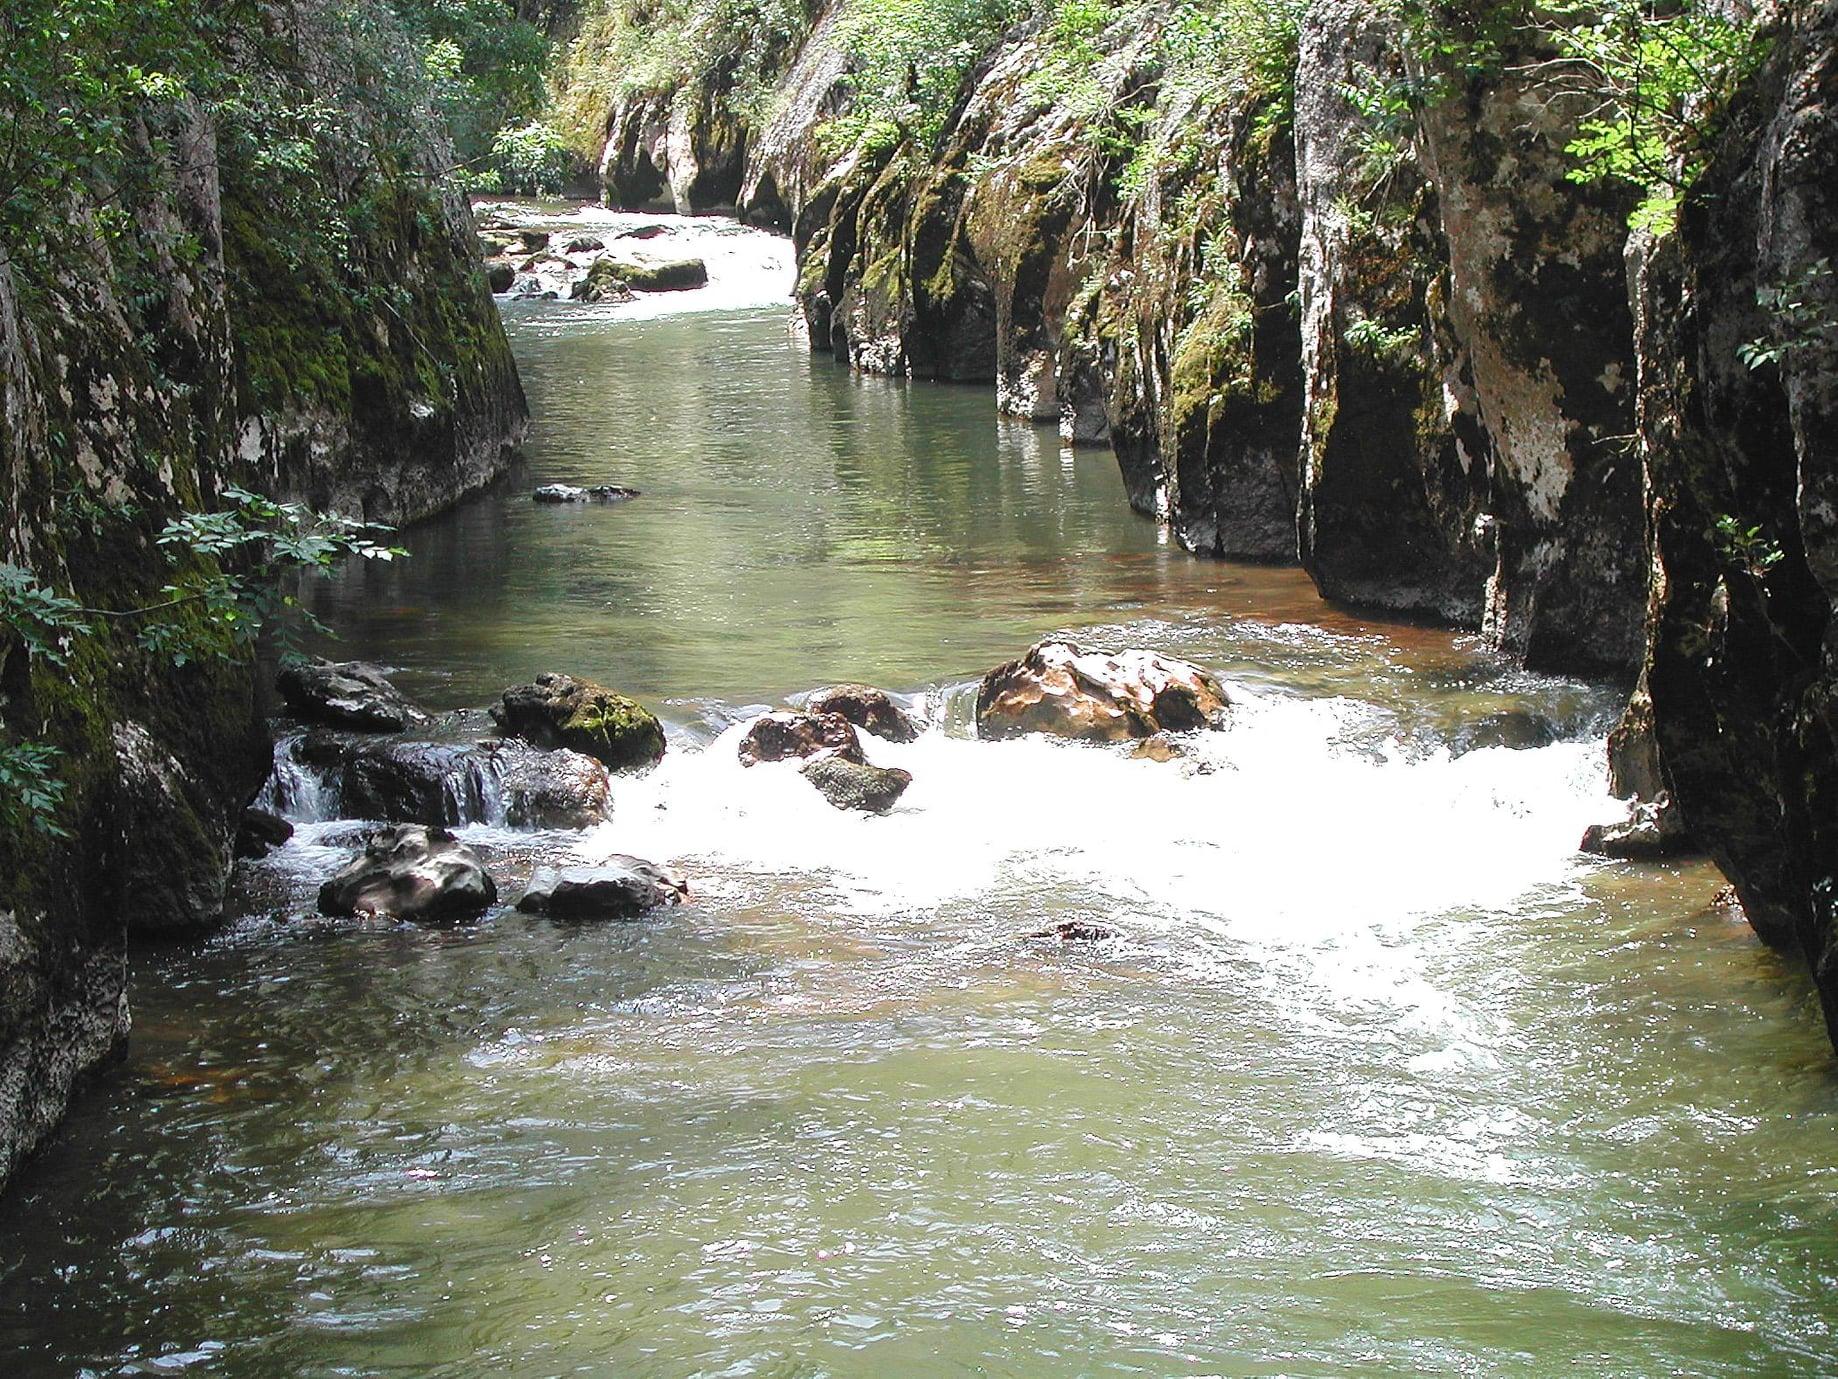 Reka Visočica, foto: Aleksandar Panić, ORSP